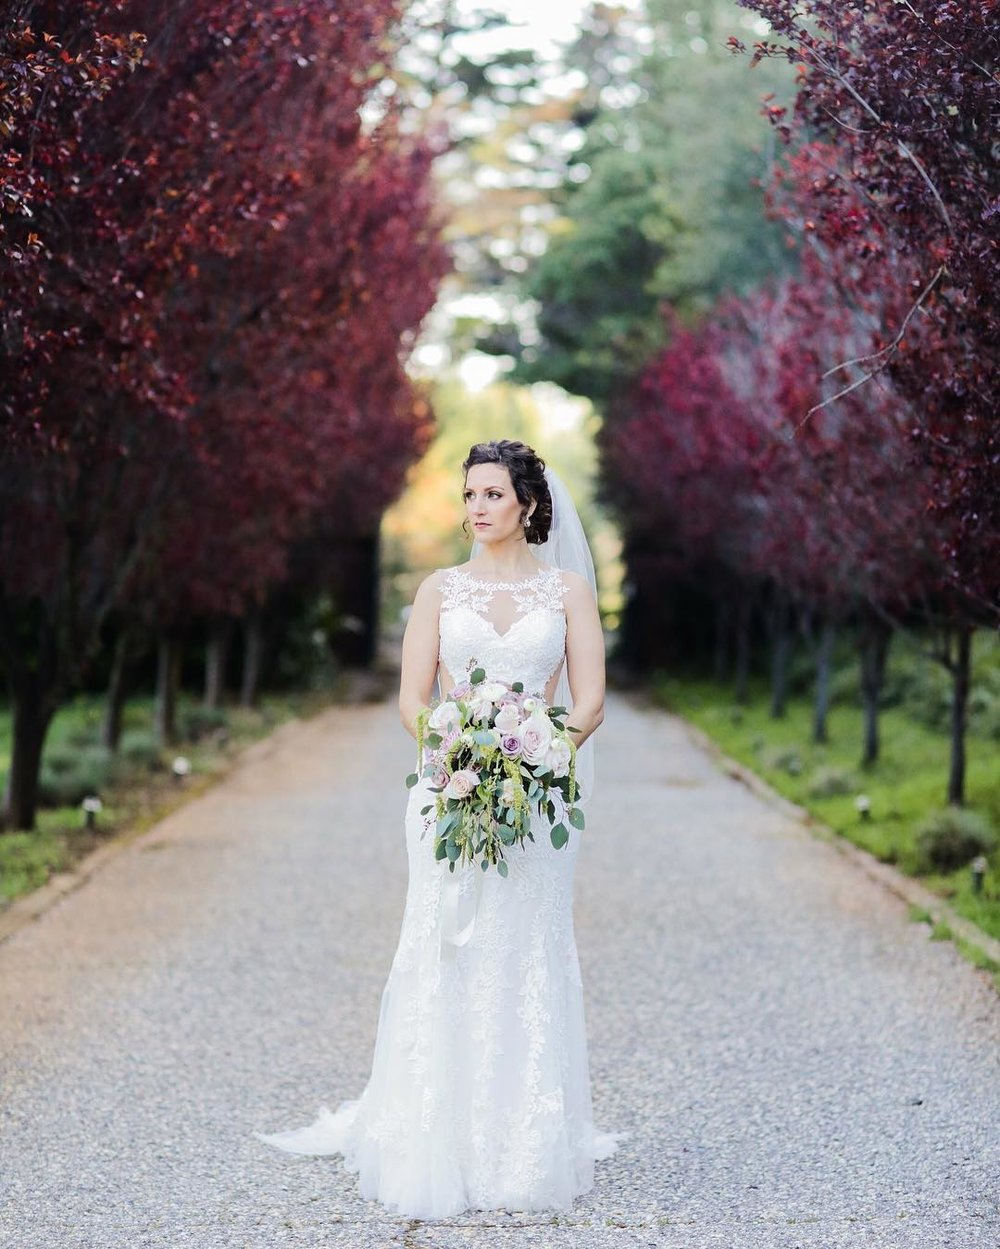 Photo: Amanda Flinn Photography |  @amandaflinnphotography   Venue:  @monteverdeinnevents   Hair/MUA:  @alyssa.hurlbert   Flowers:  @martha_s_andrews   Dress: Lillian West |  @bylillianwest